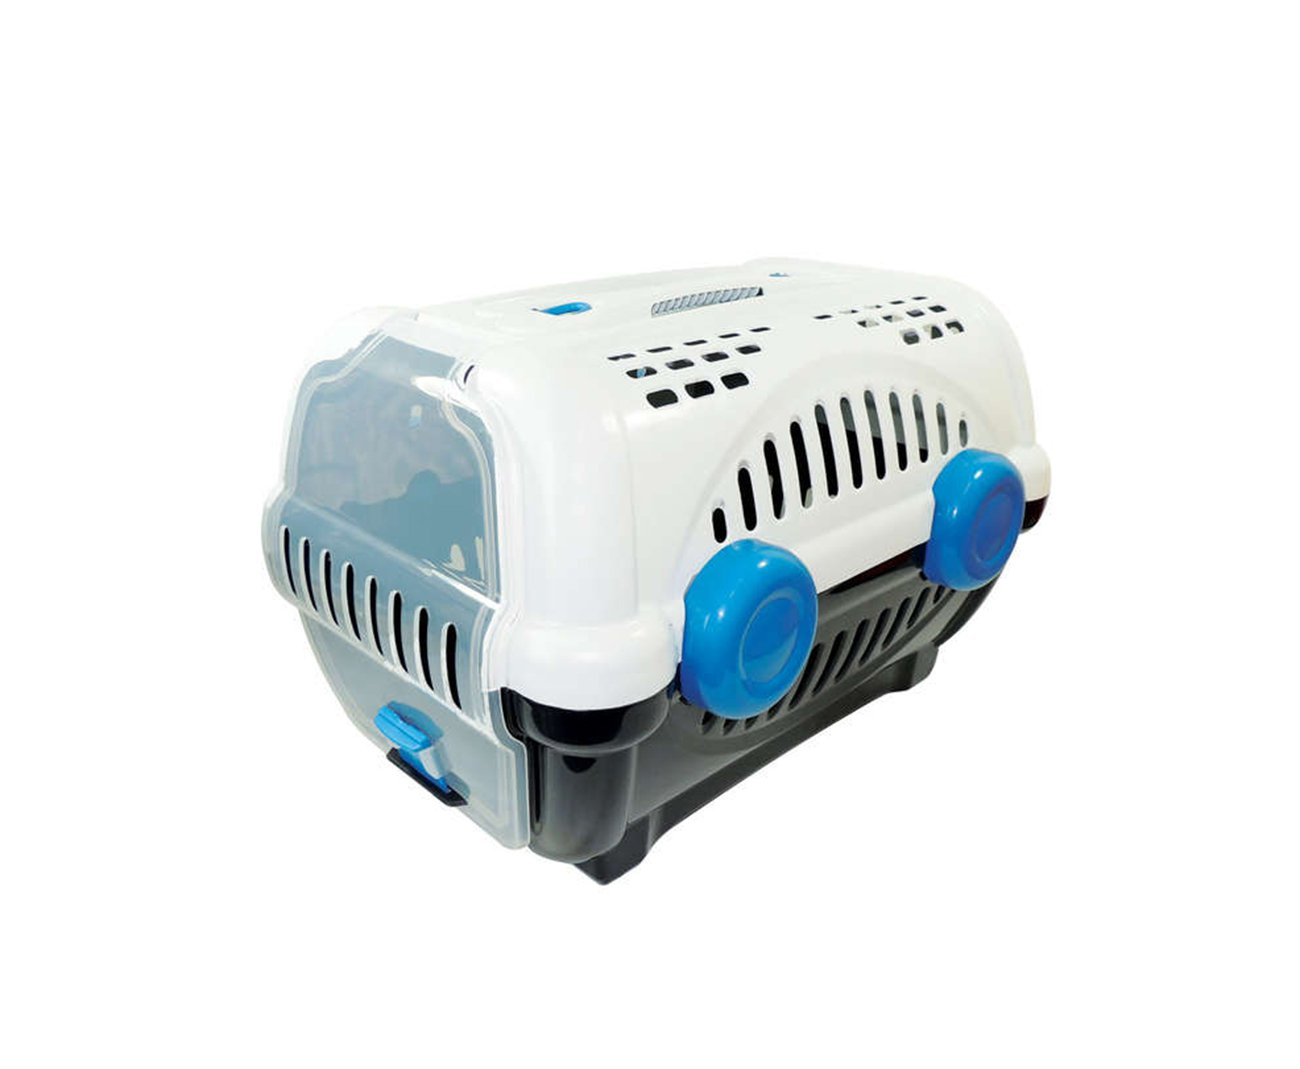 Caixa De Transporte Luxo N1 - Branca/azul - Furacãopet